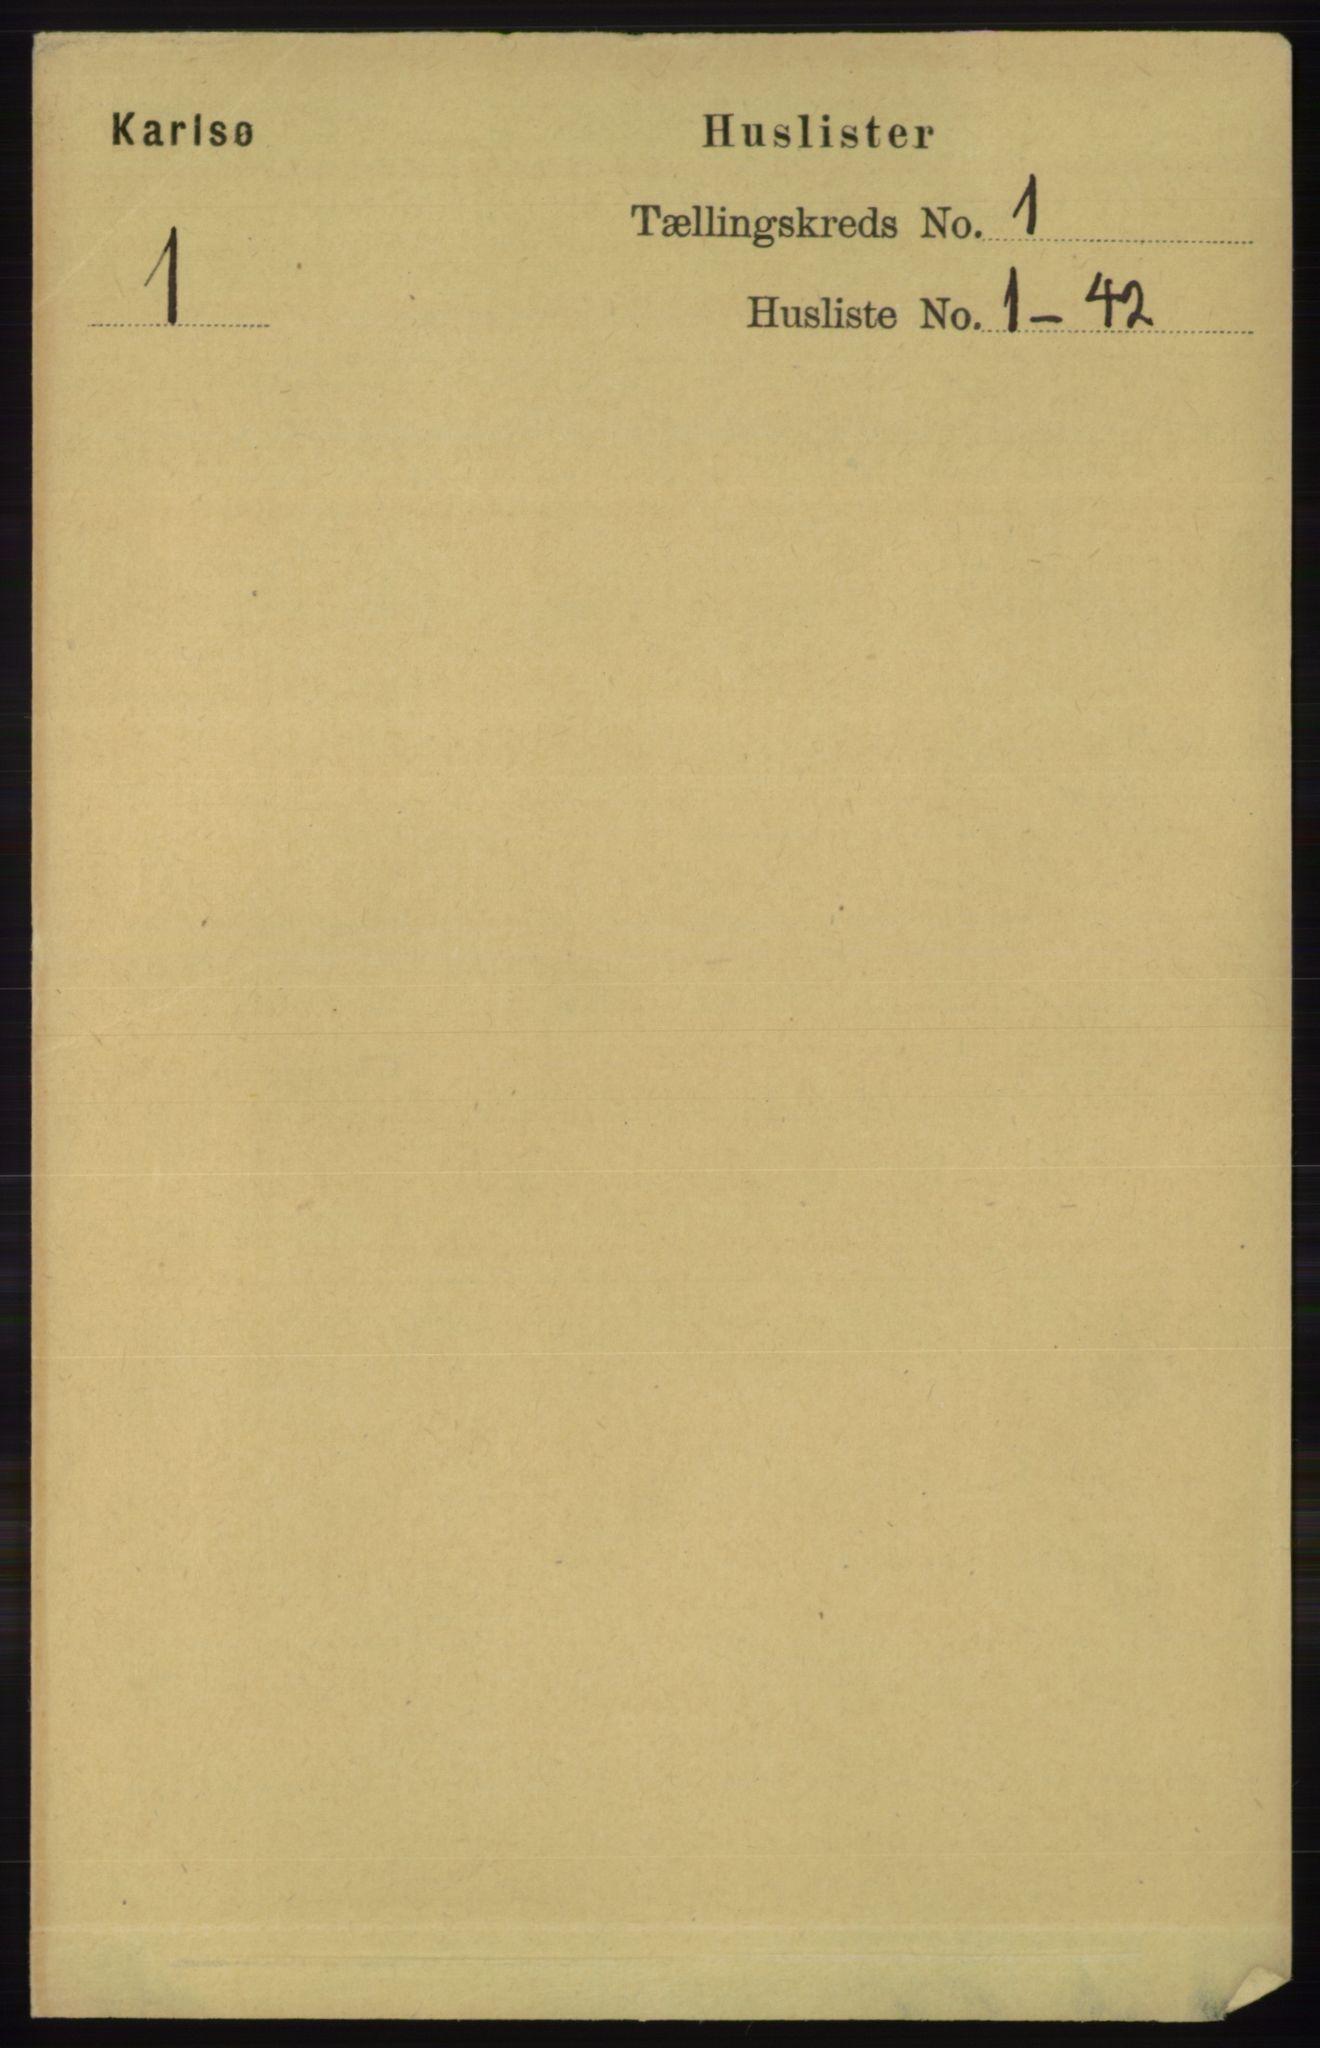 RA, Folketelling 1891 for 1936 Karlsøy herred, 1891, s. 15